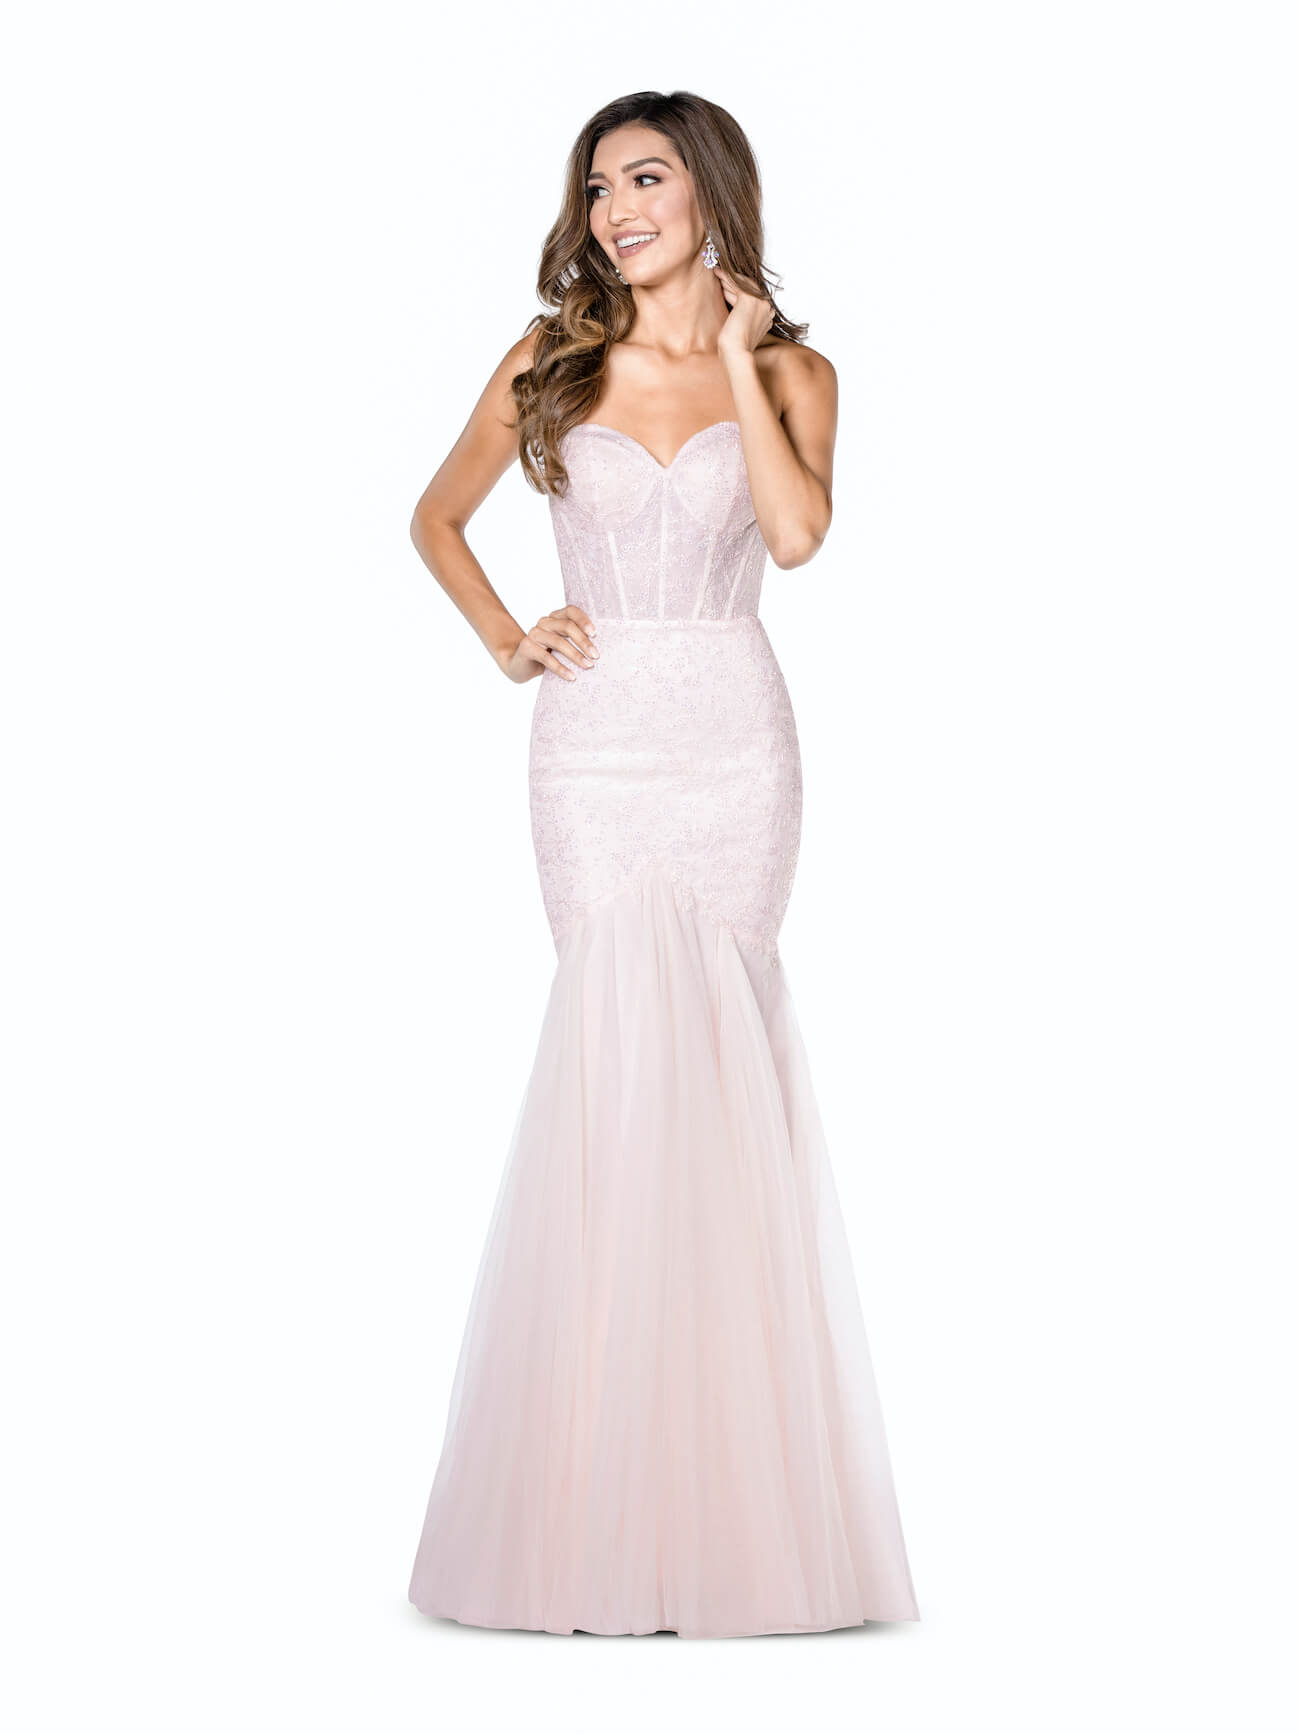 Vienna Light Pink Size 8 Corset Strapless Mermaid Dress on Queenly